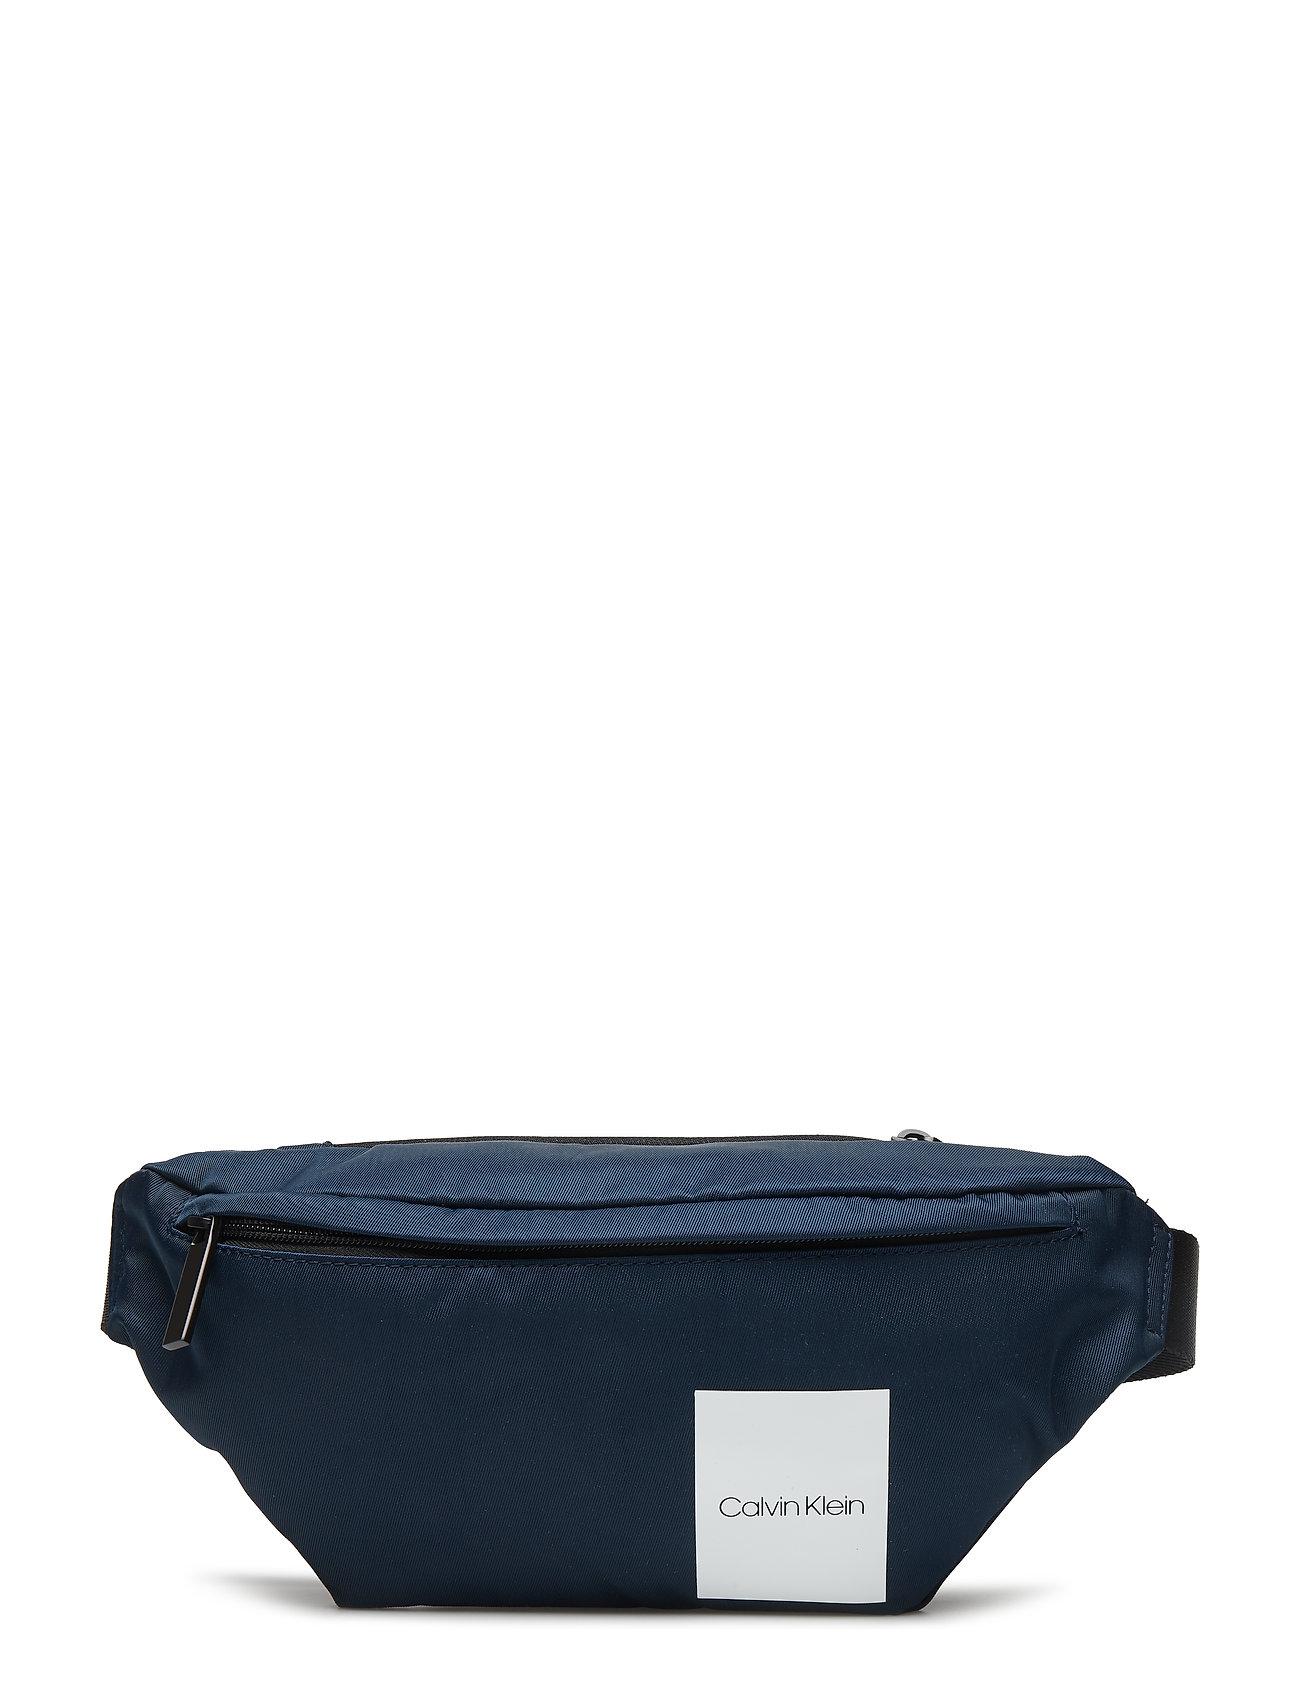 Calvin Klein ITEM STORY WAIST BAG